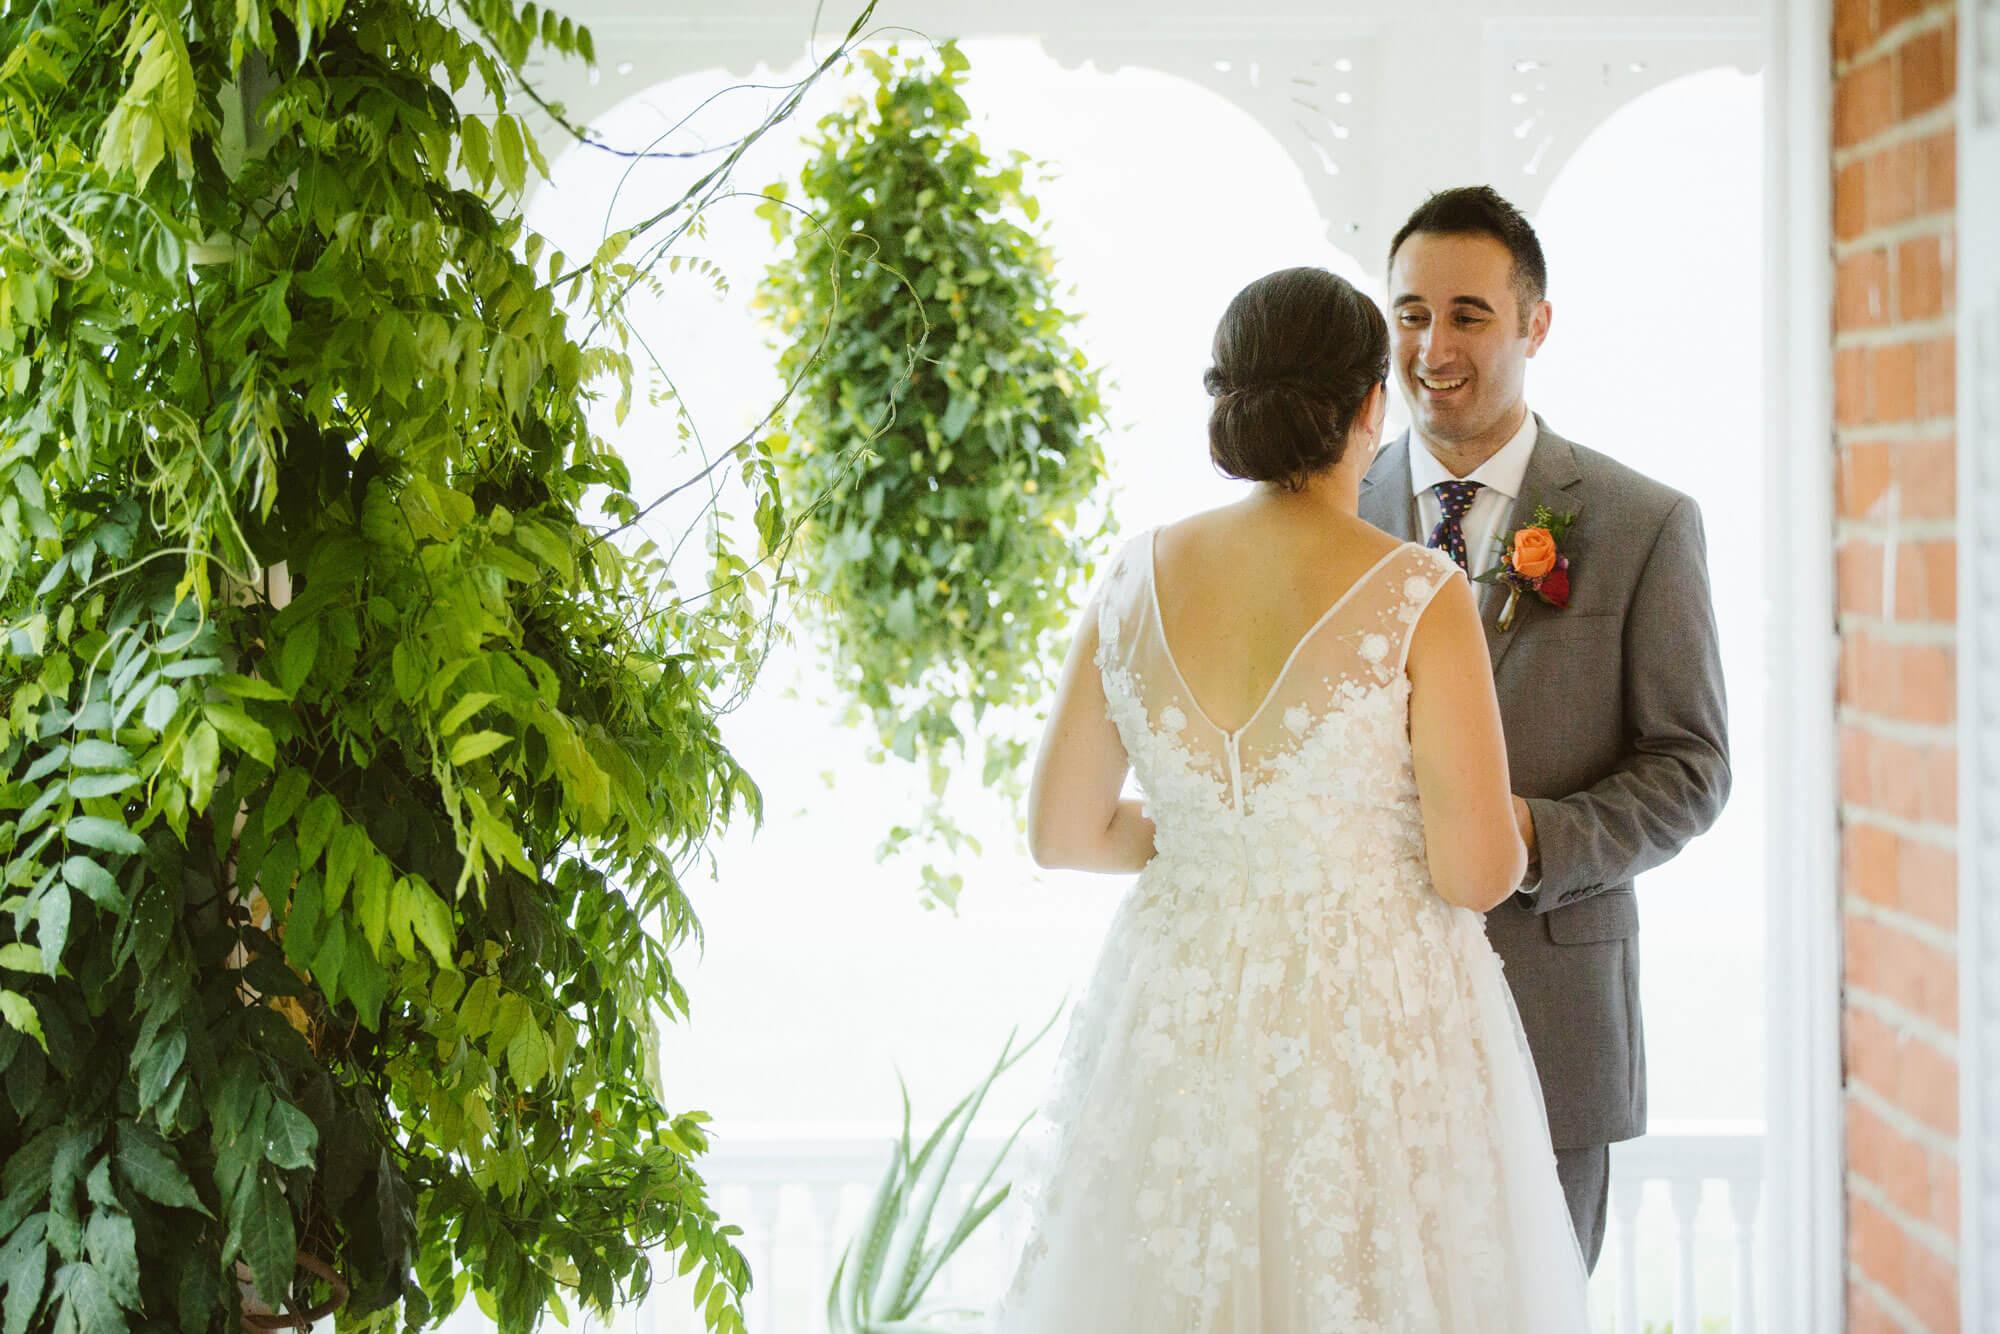 Erica-Kay-Photography---Kate-_-Joe-Wedding-14.jpg